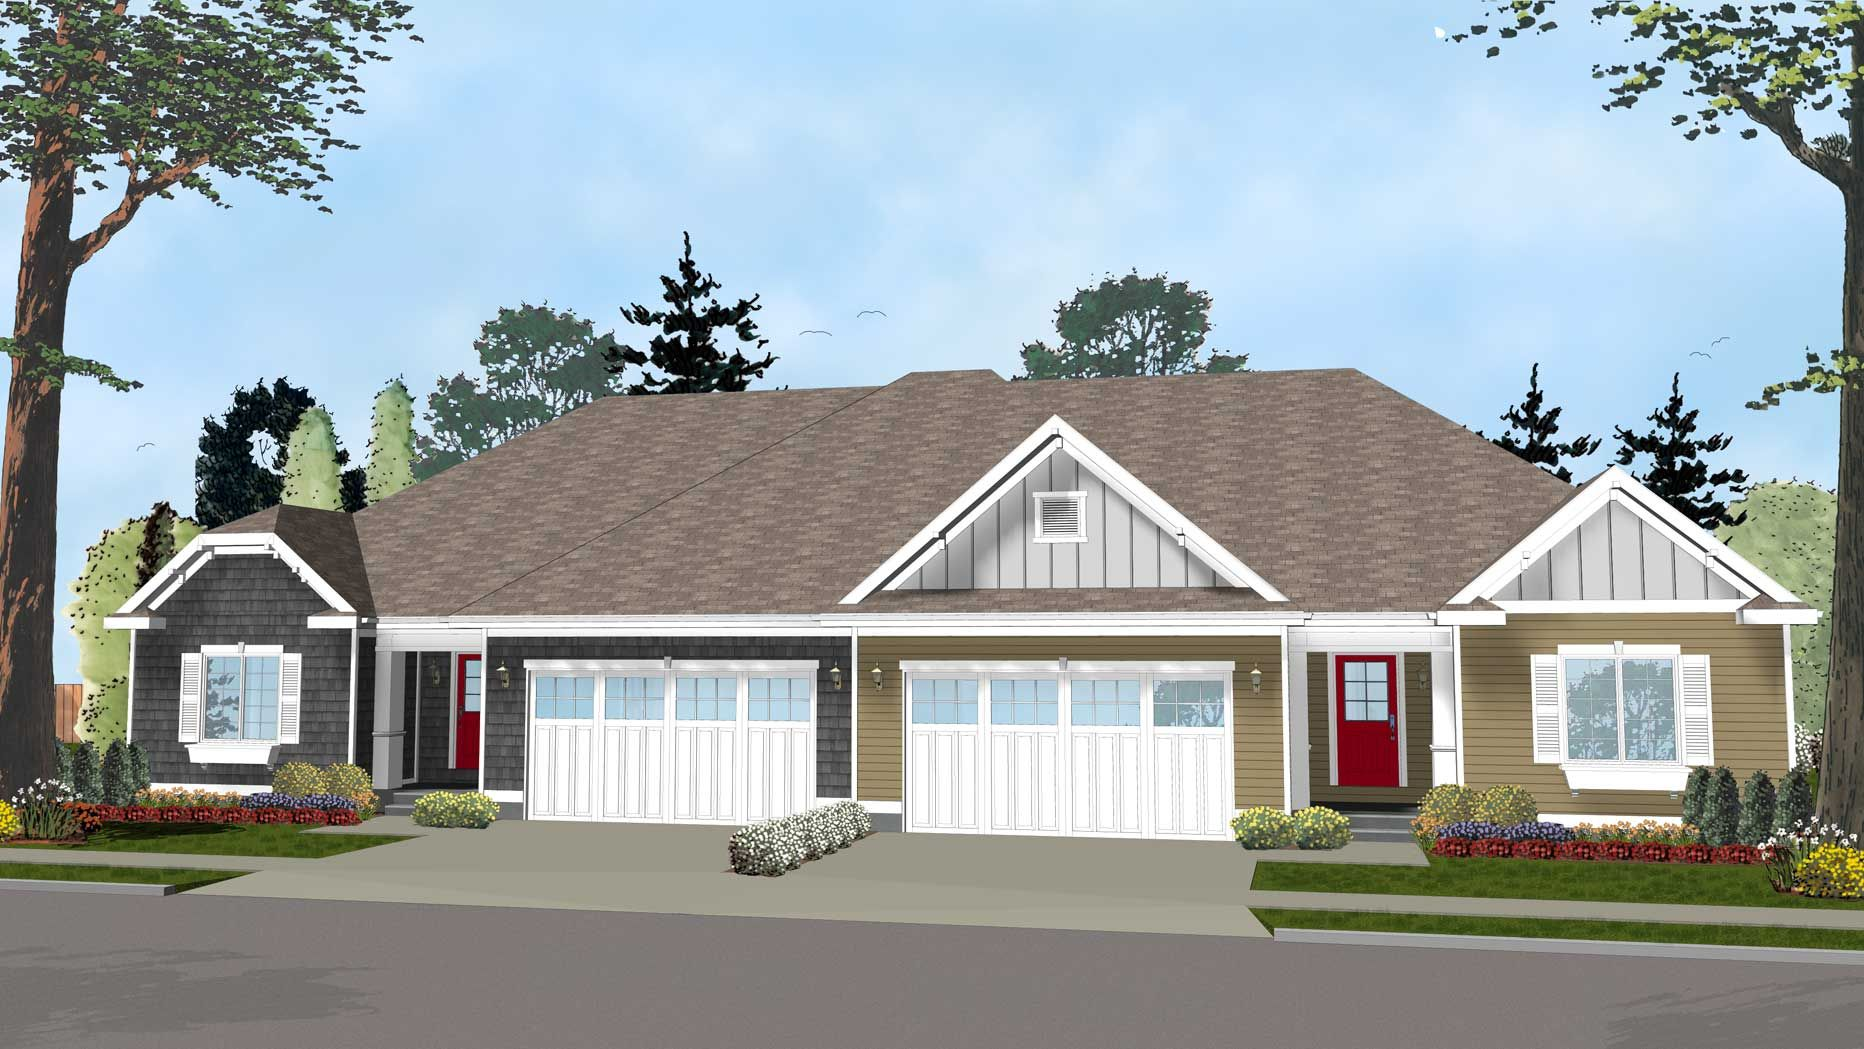 Plan Easy To Build Duplex House Plan Duplex House Plans